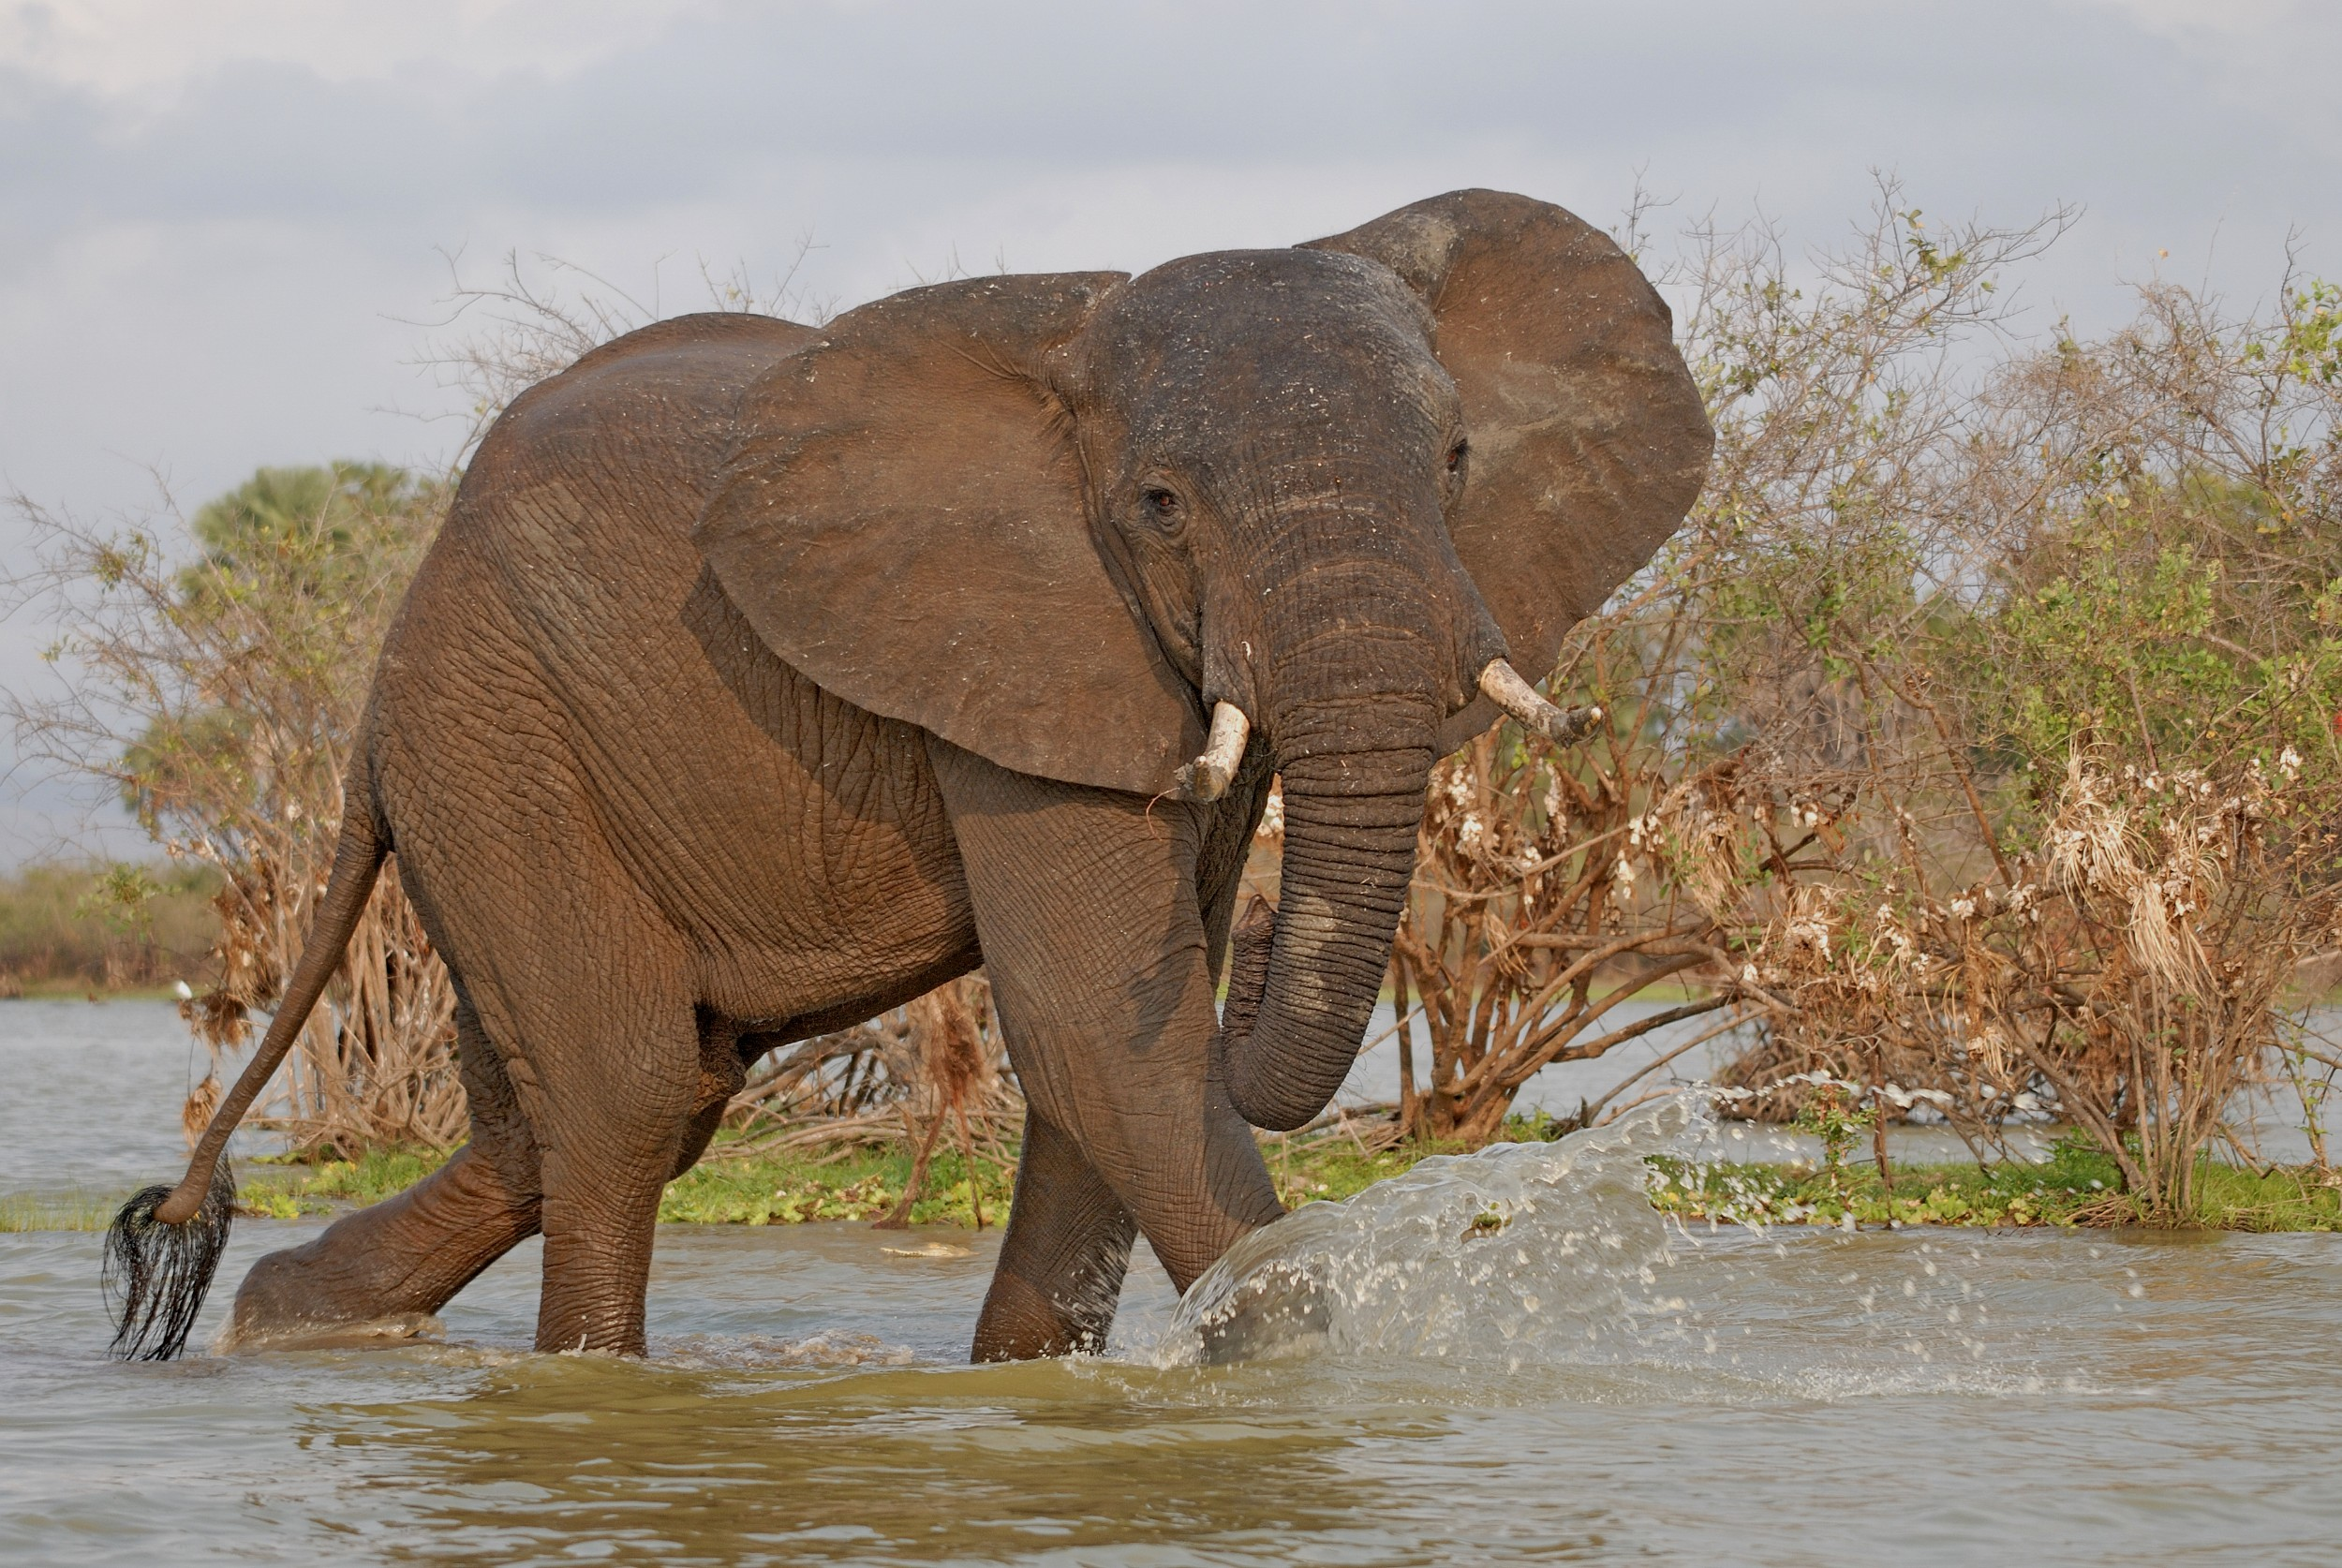 PL-Selous-elephant-splashing-river.jpg